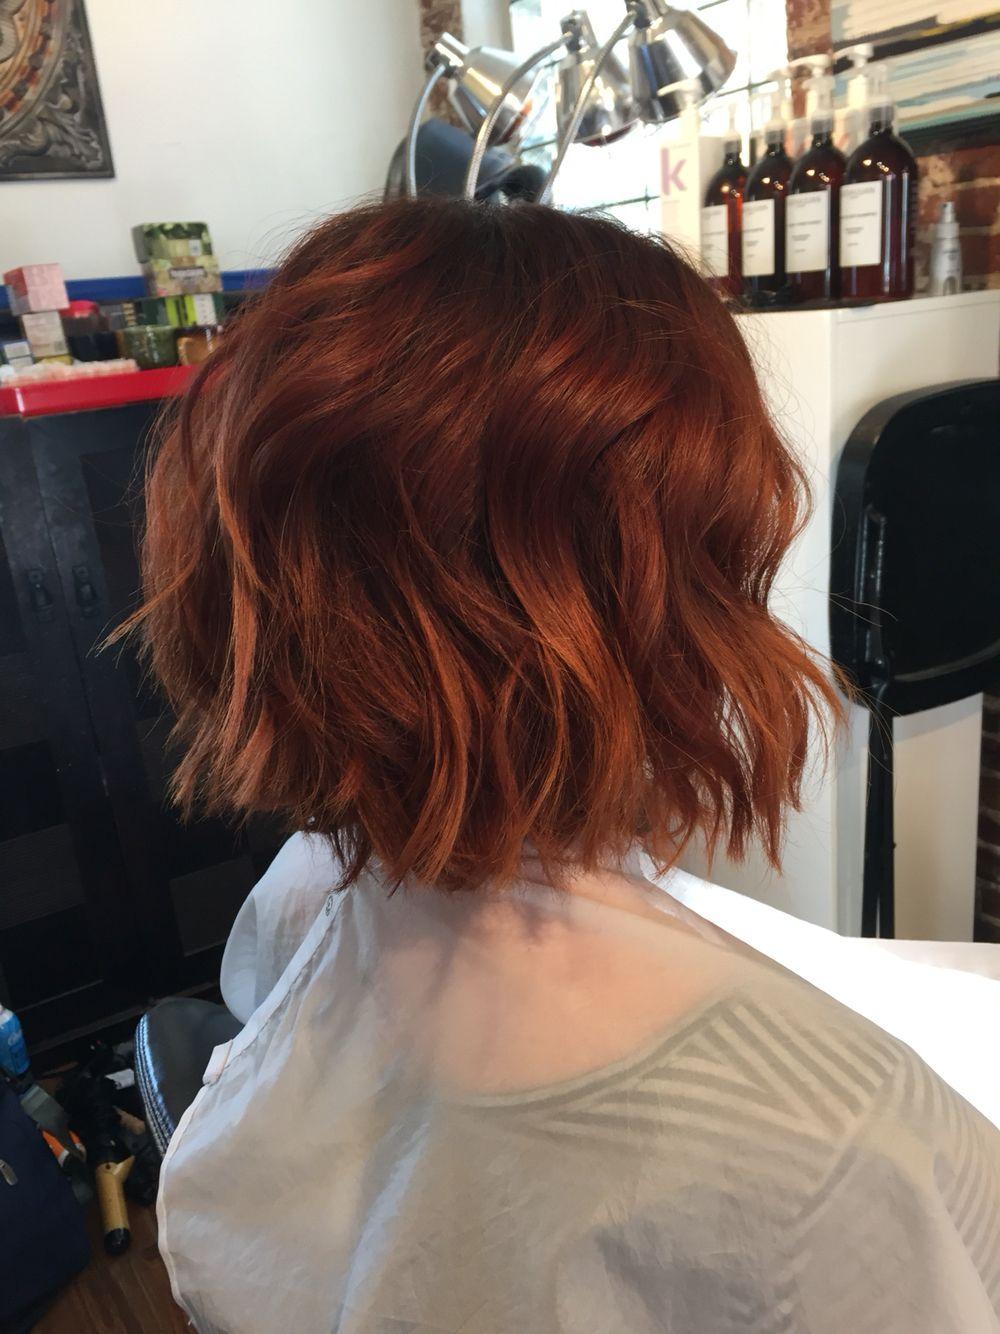 Short red hair hairmakeup pinterest short red hair red hair